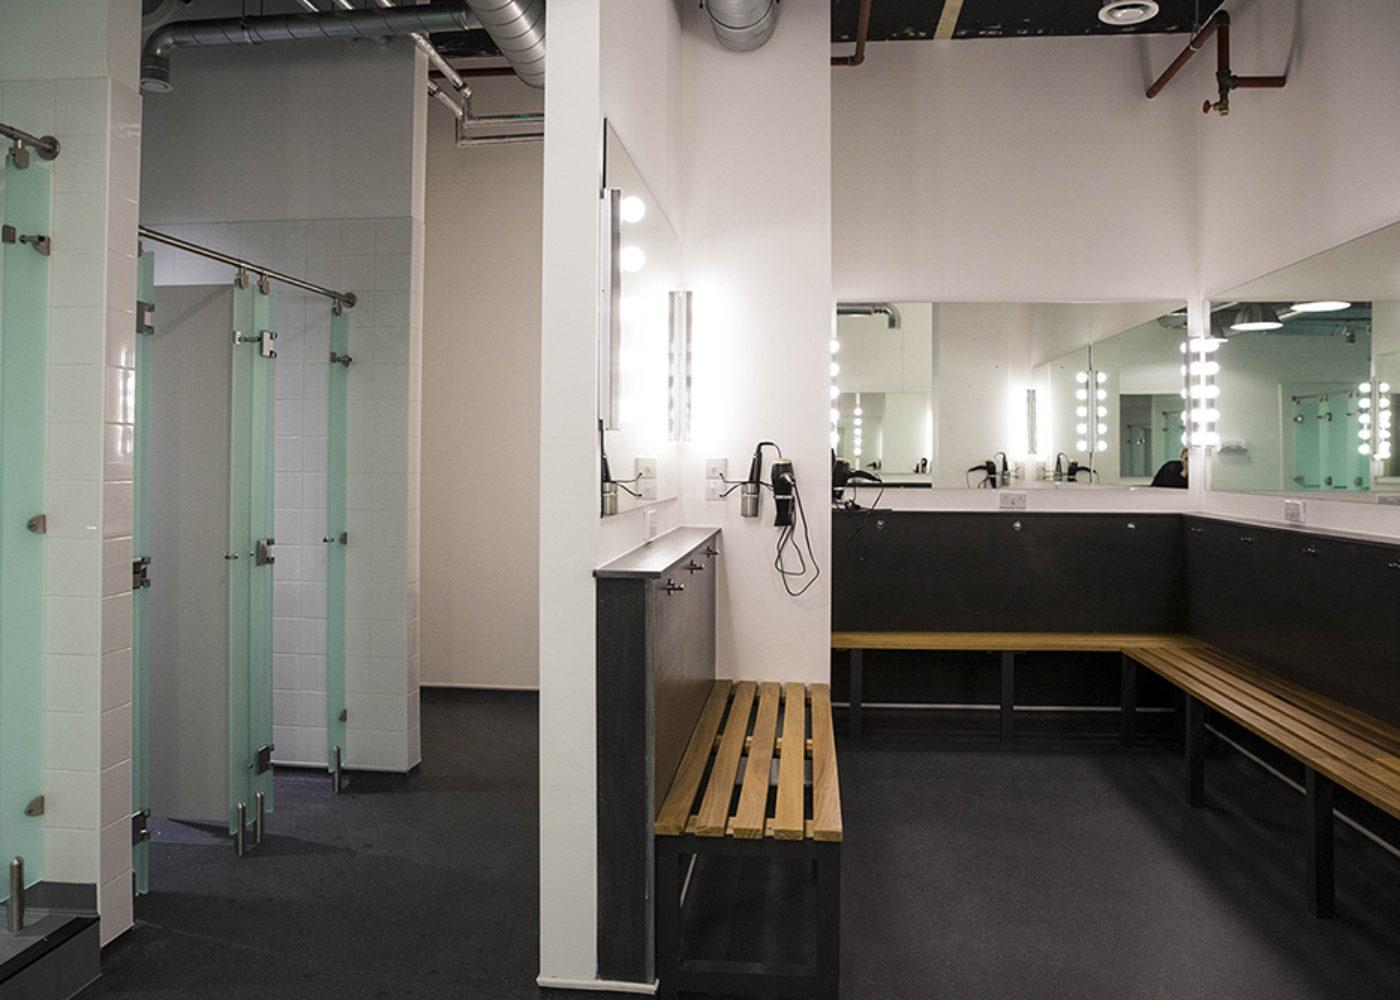 FRAME-03-21-16-Victoria-Studio-067